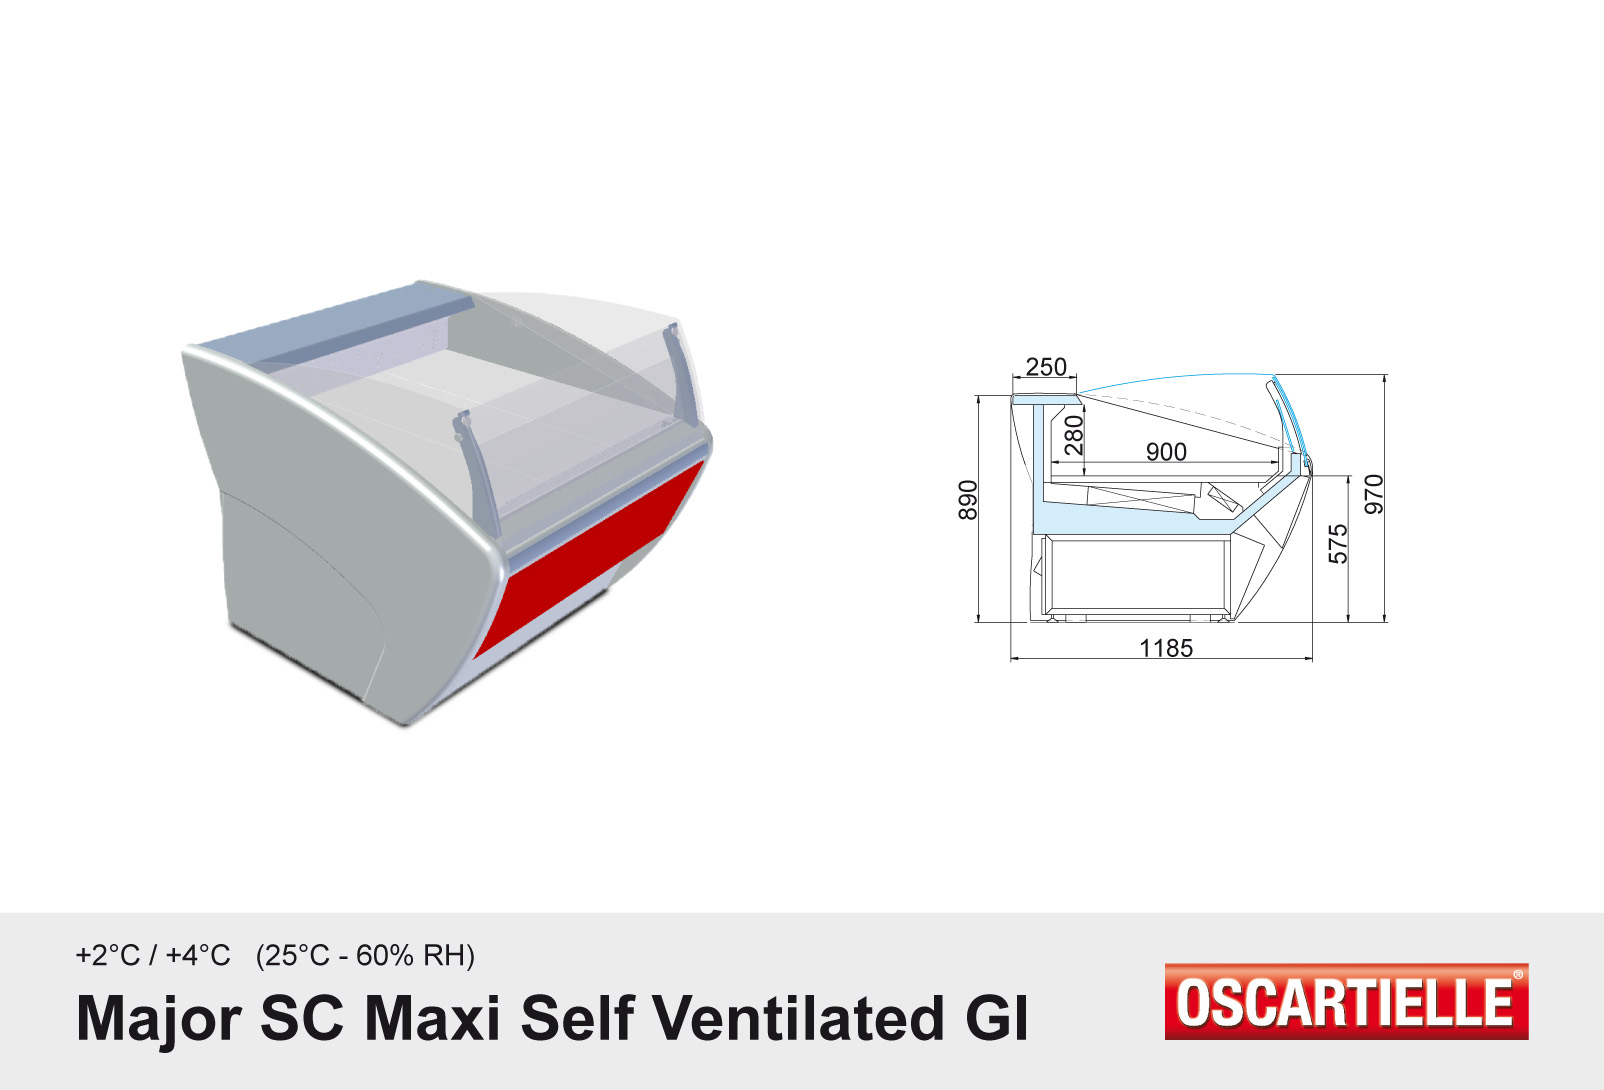 Major SC Maxi self